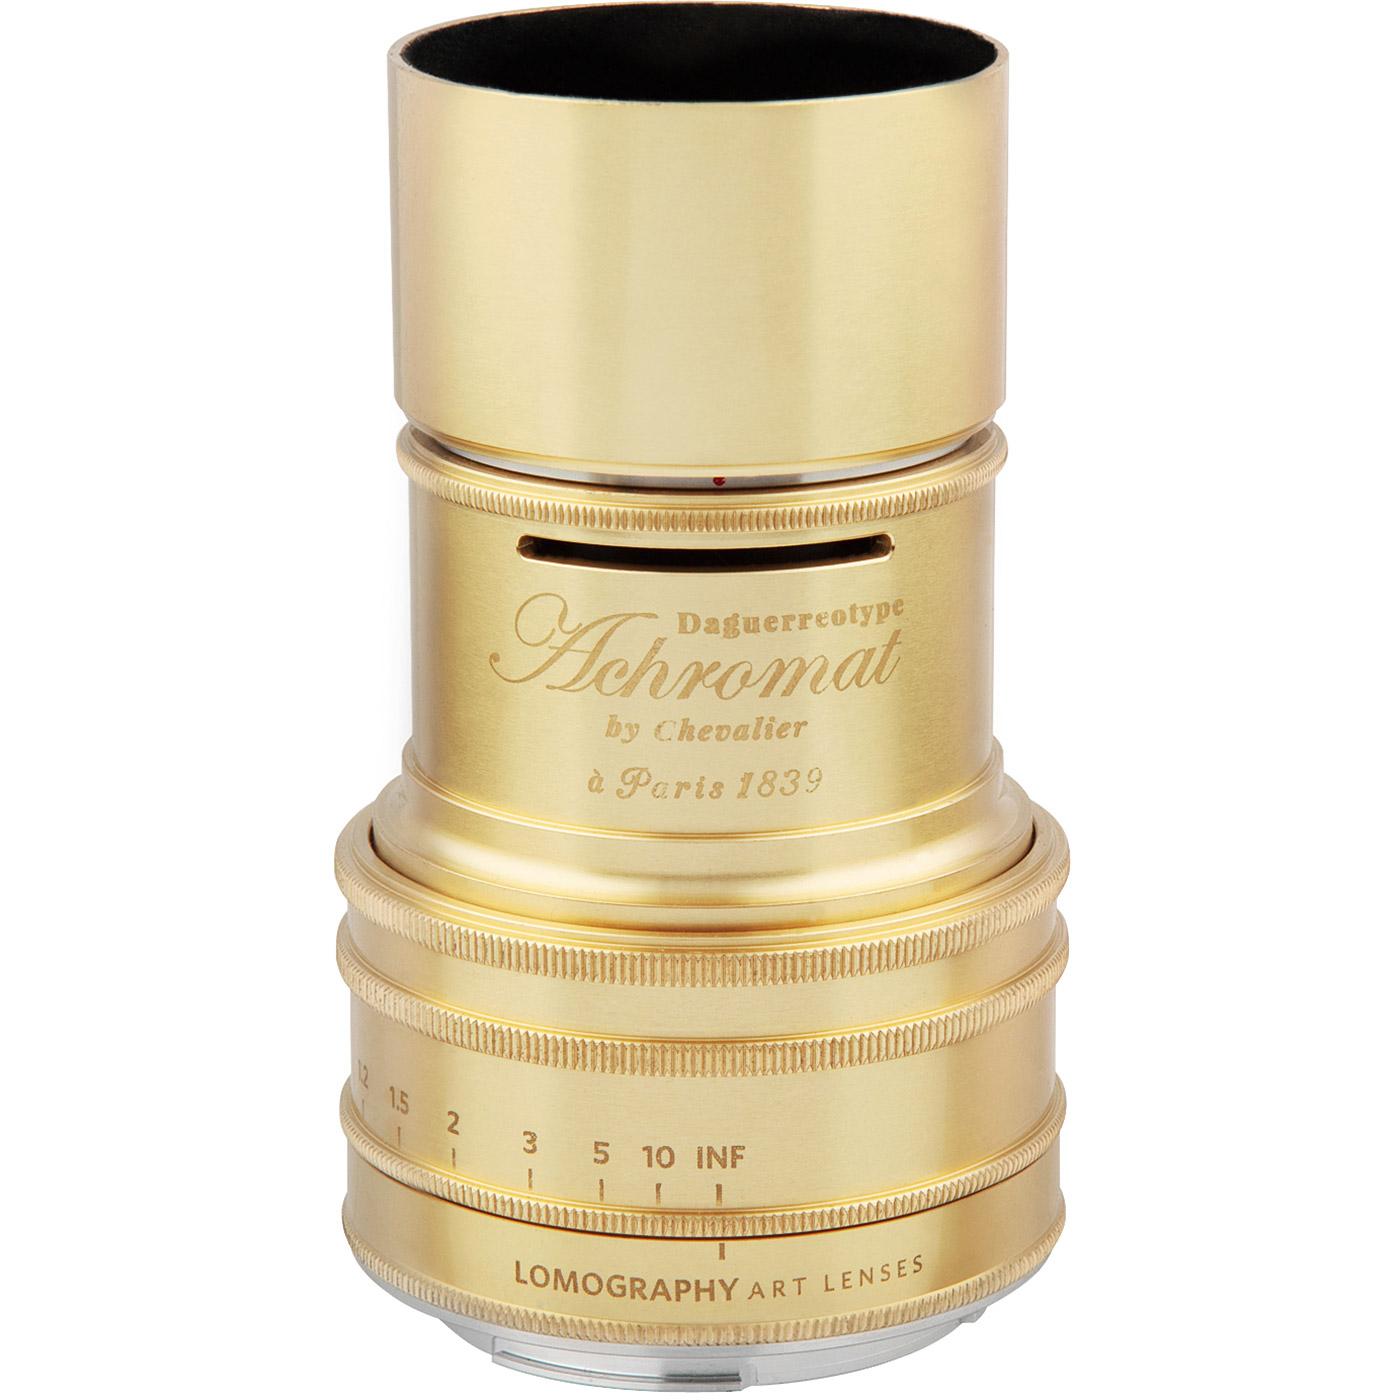 Daguerreotype Achromat 29 64 Messing Lomo Petzval 85 F 22 Bokeh Control Lens Brass Sonstiges Monochrom Shop